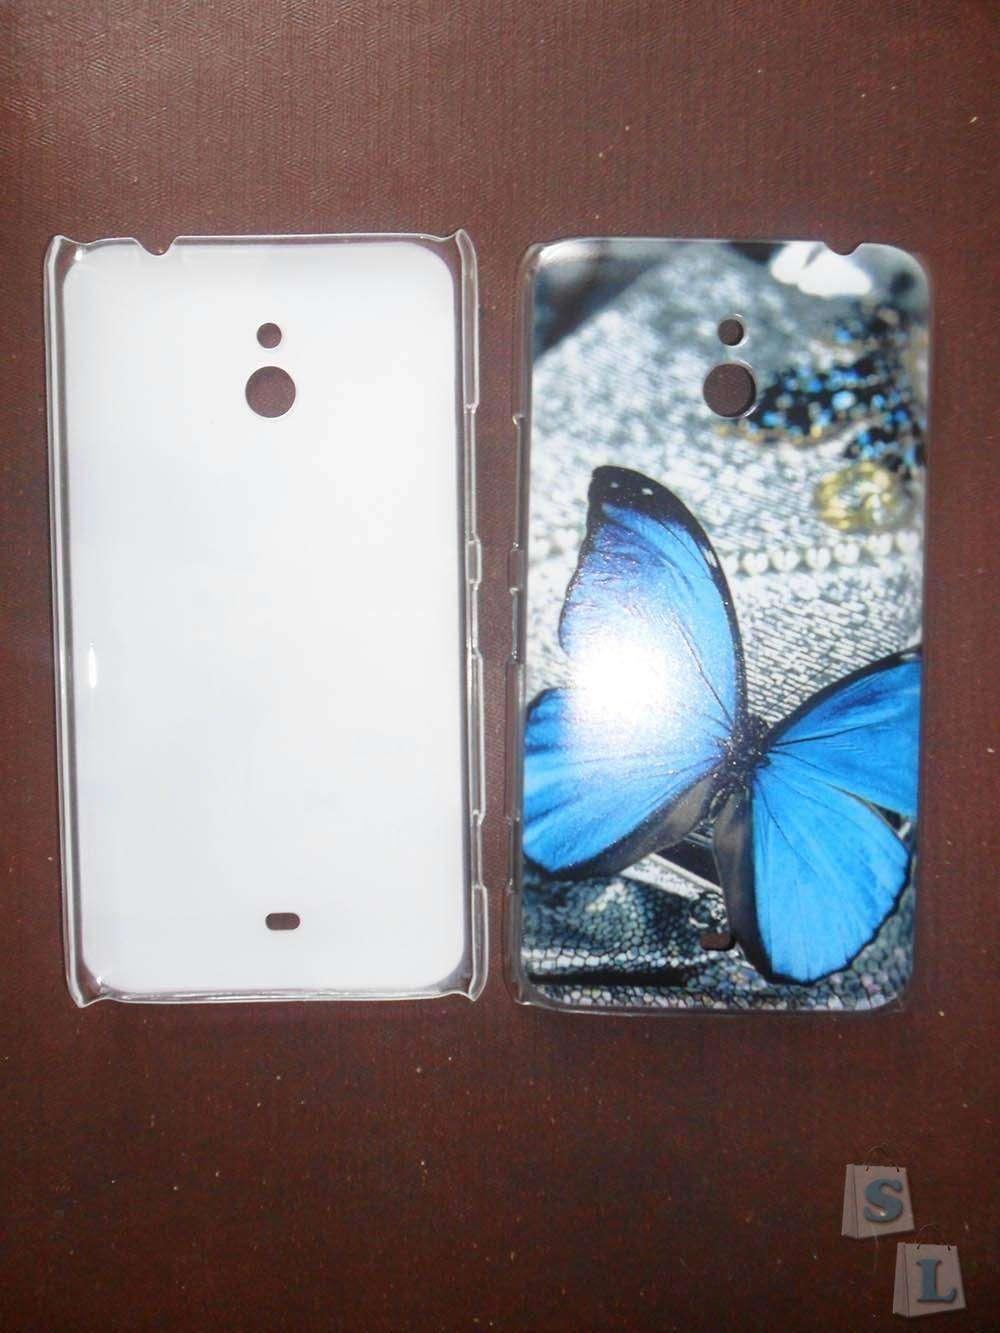 Aliexpress: Два бампера для Nokia Lumia 1320